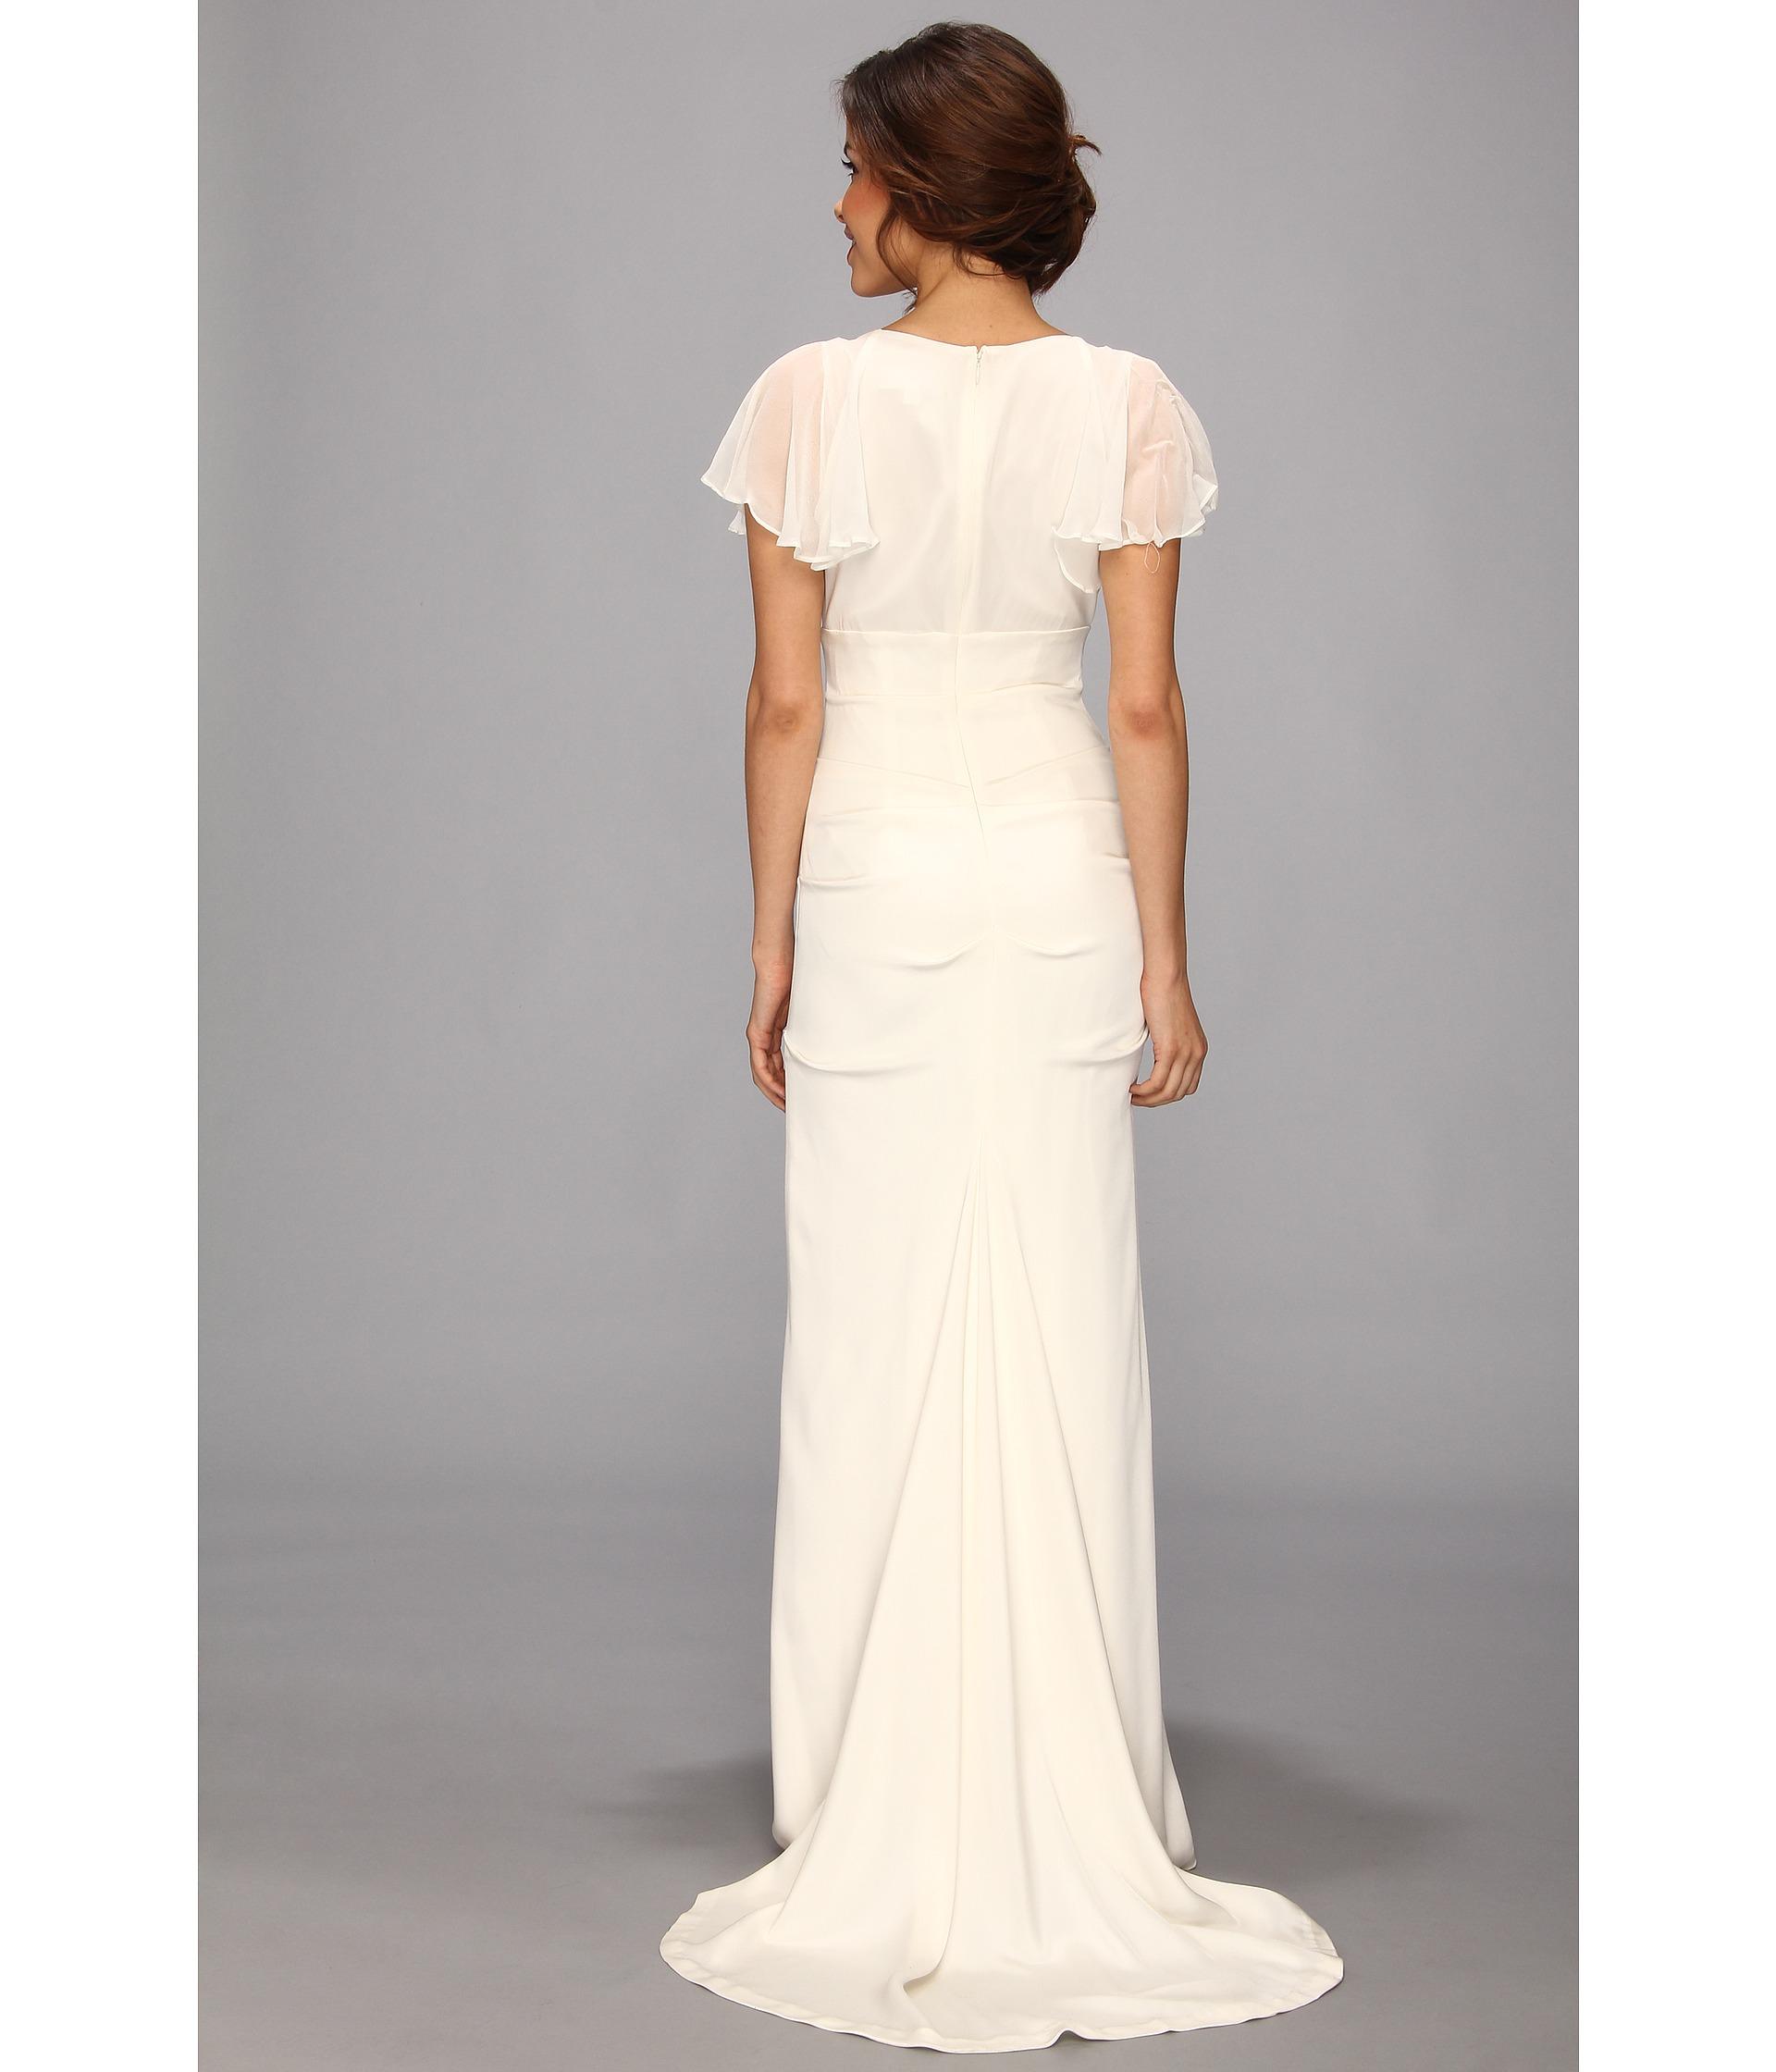 Nicole miller silk stretch flutter sleeve bridal gown in for Helen miller wedding dresses